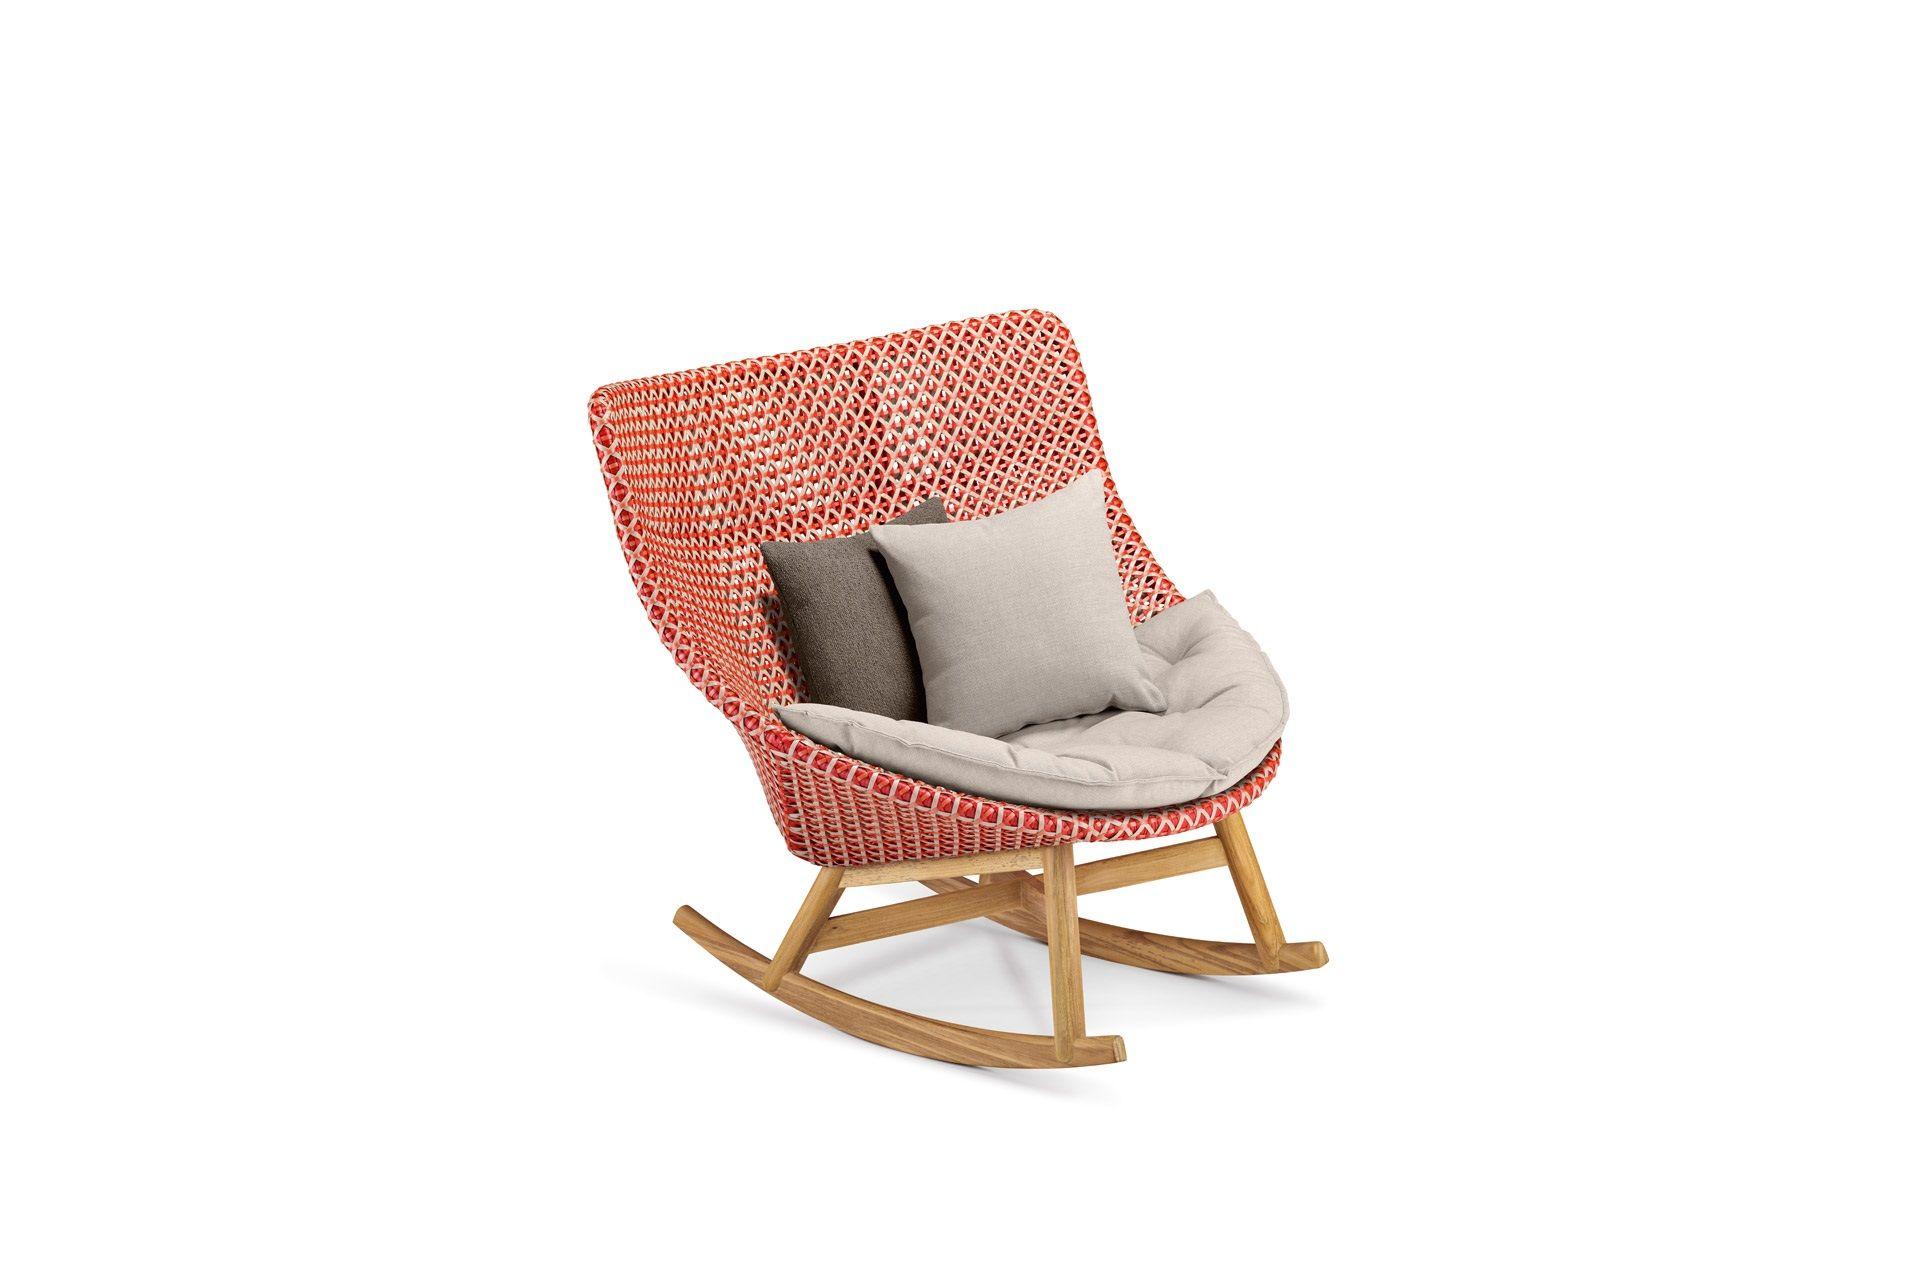 DEDON Mbrace Rocking chair decocushion pepper